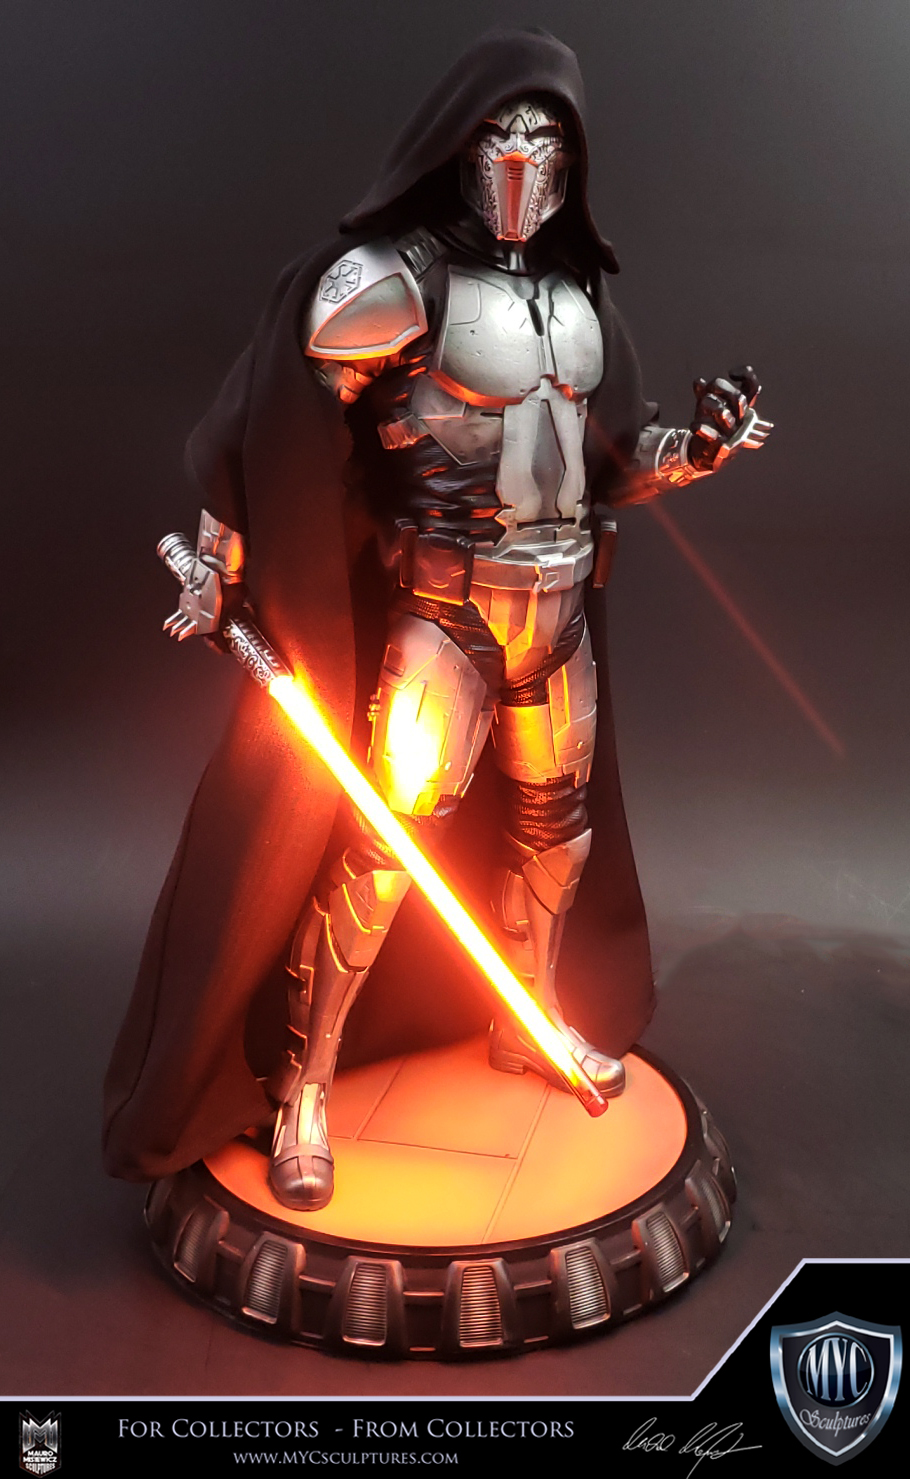 Sith_Acolyte_MYC_Sculptures_Statue_01